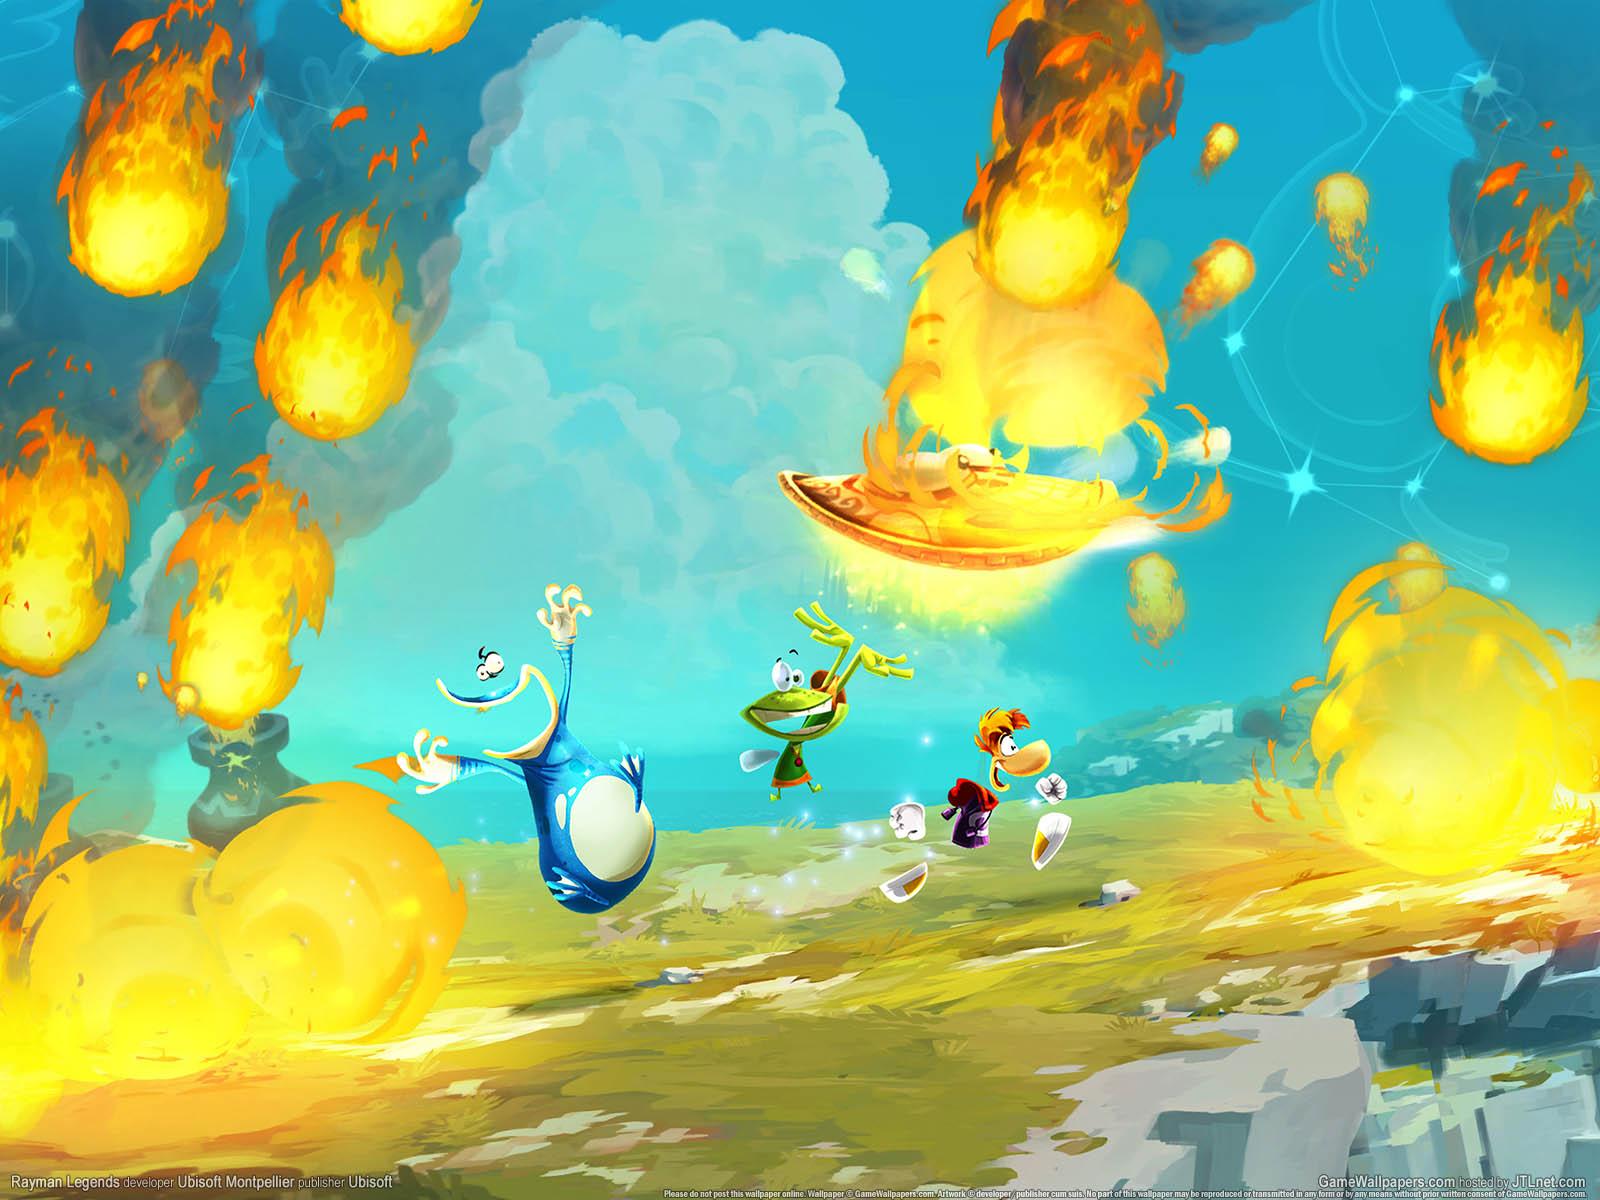 Rayman Legendsνmmer=04 achtergrond  1600x1200